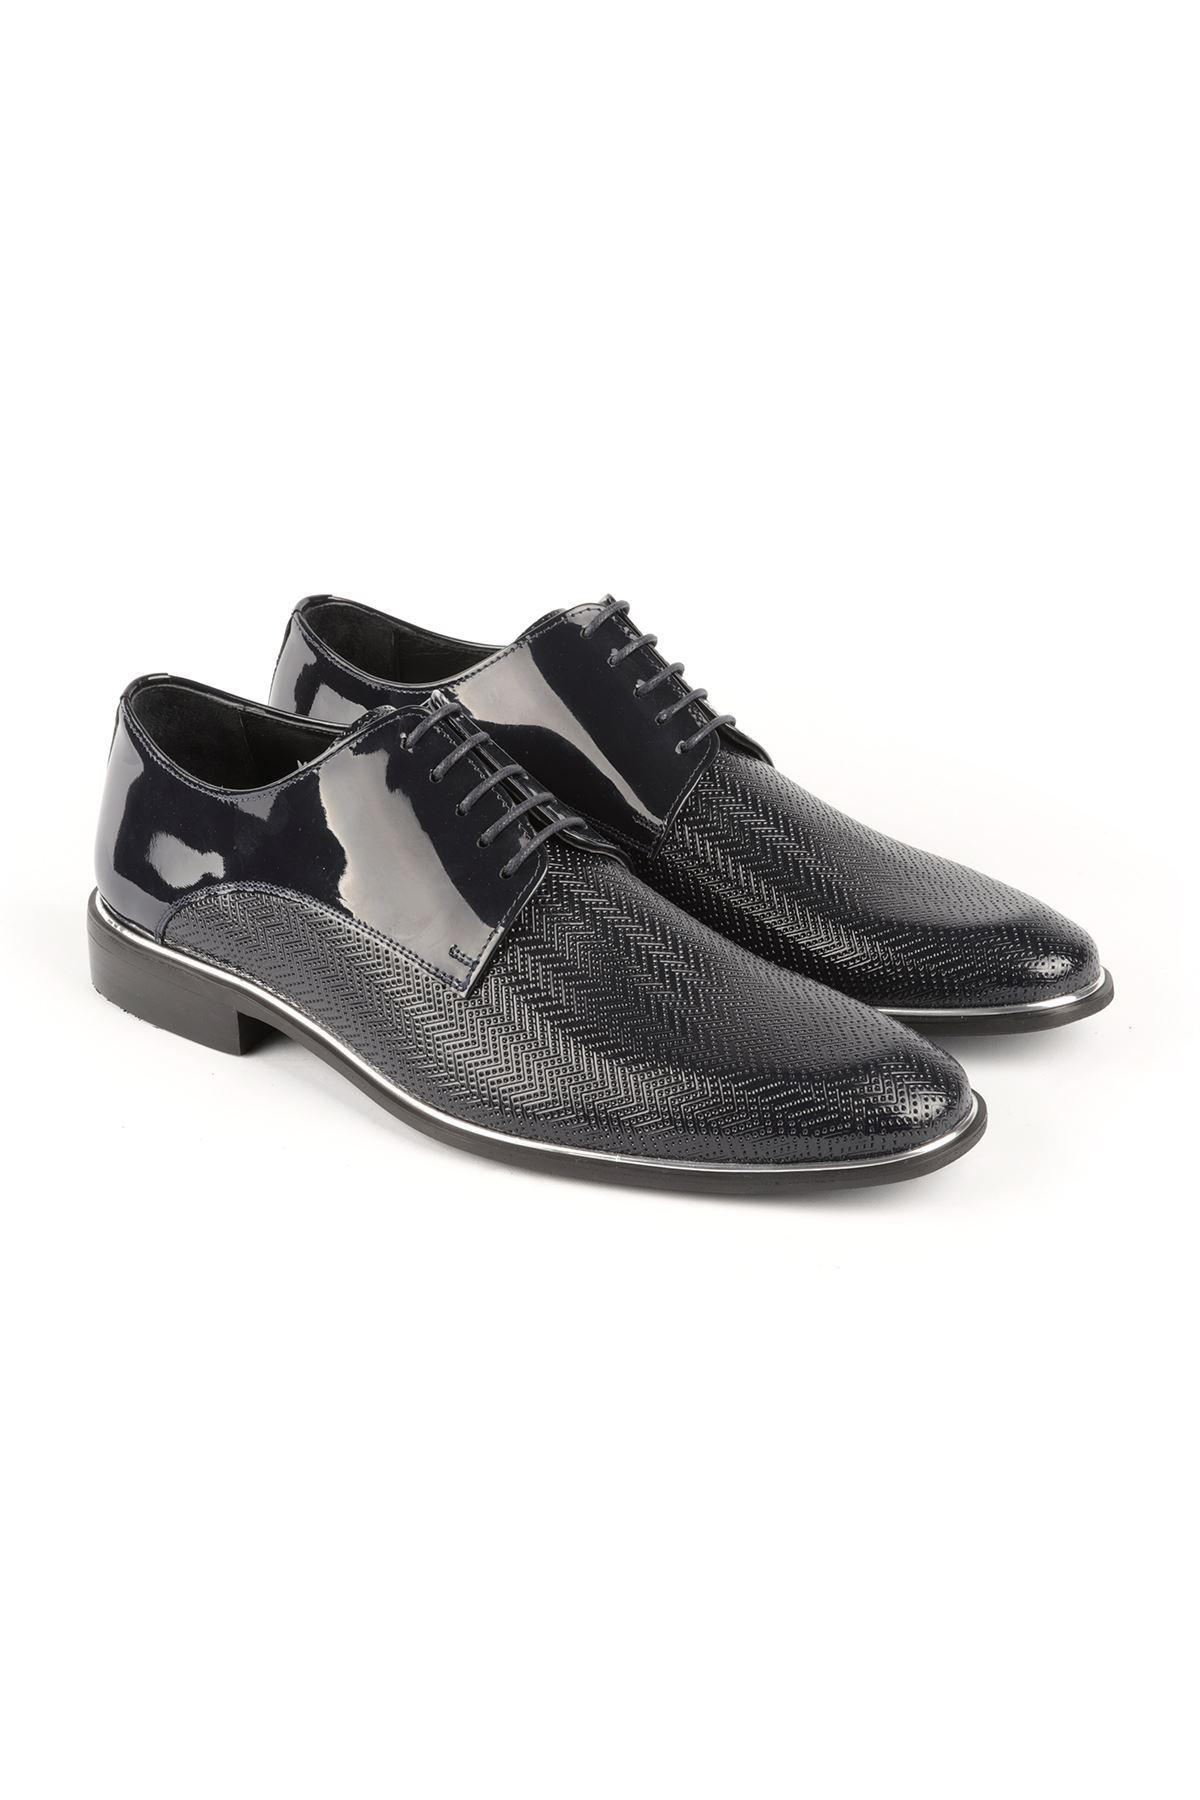 Libero L3580 Lacivert Klasik Ayakkabı